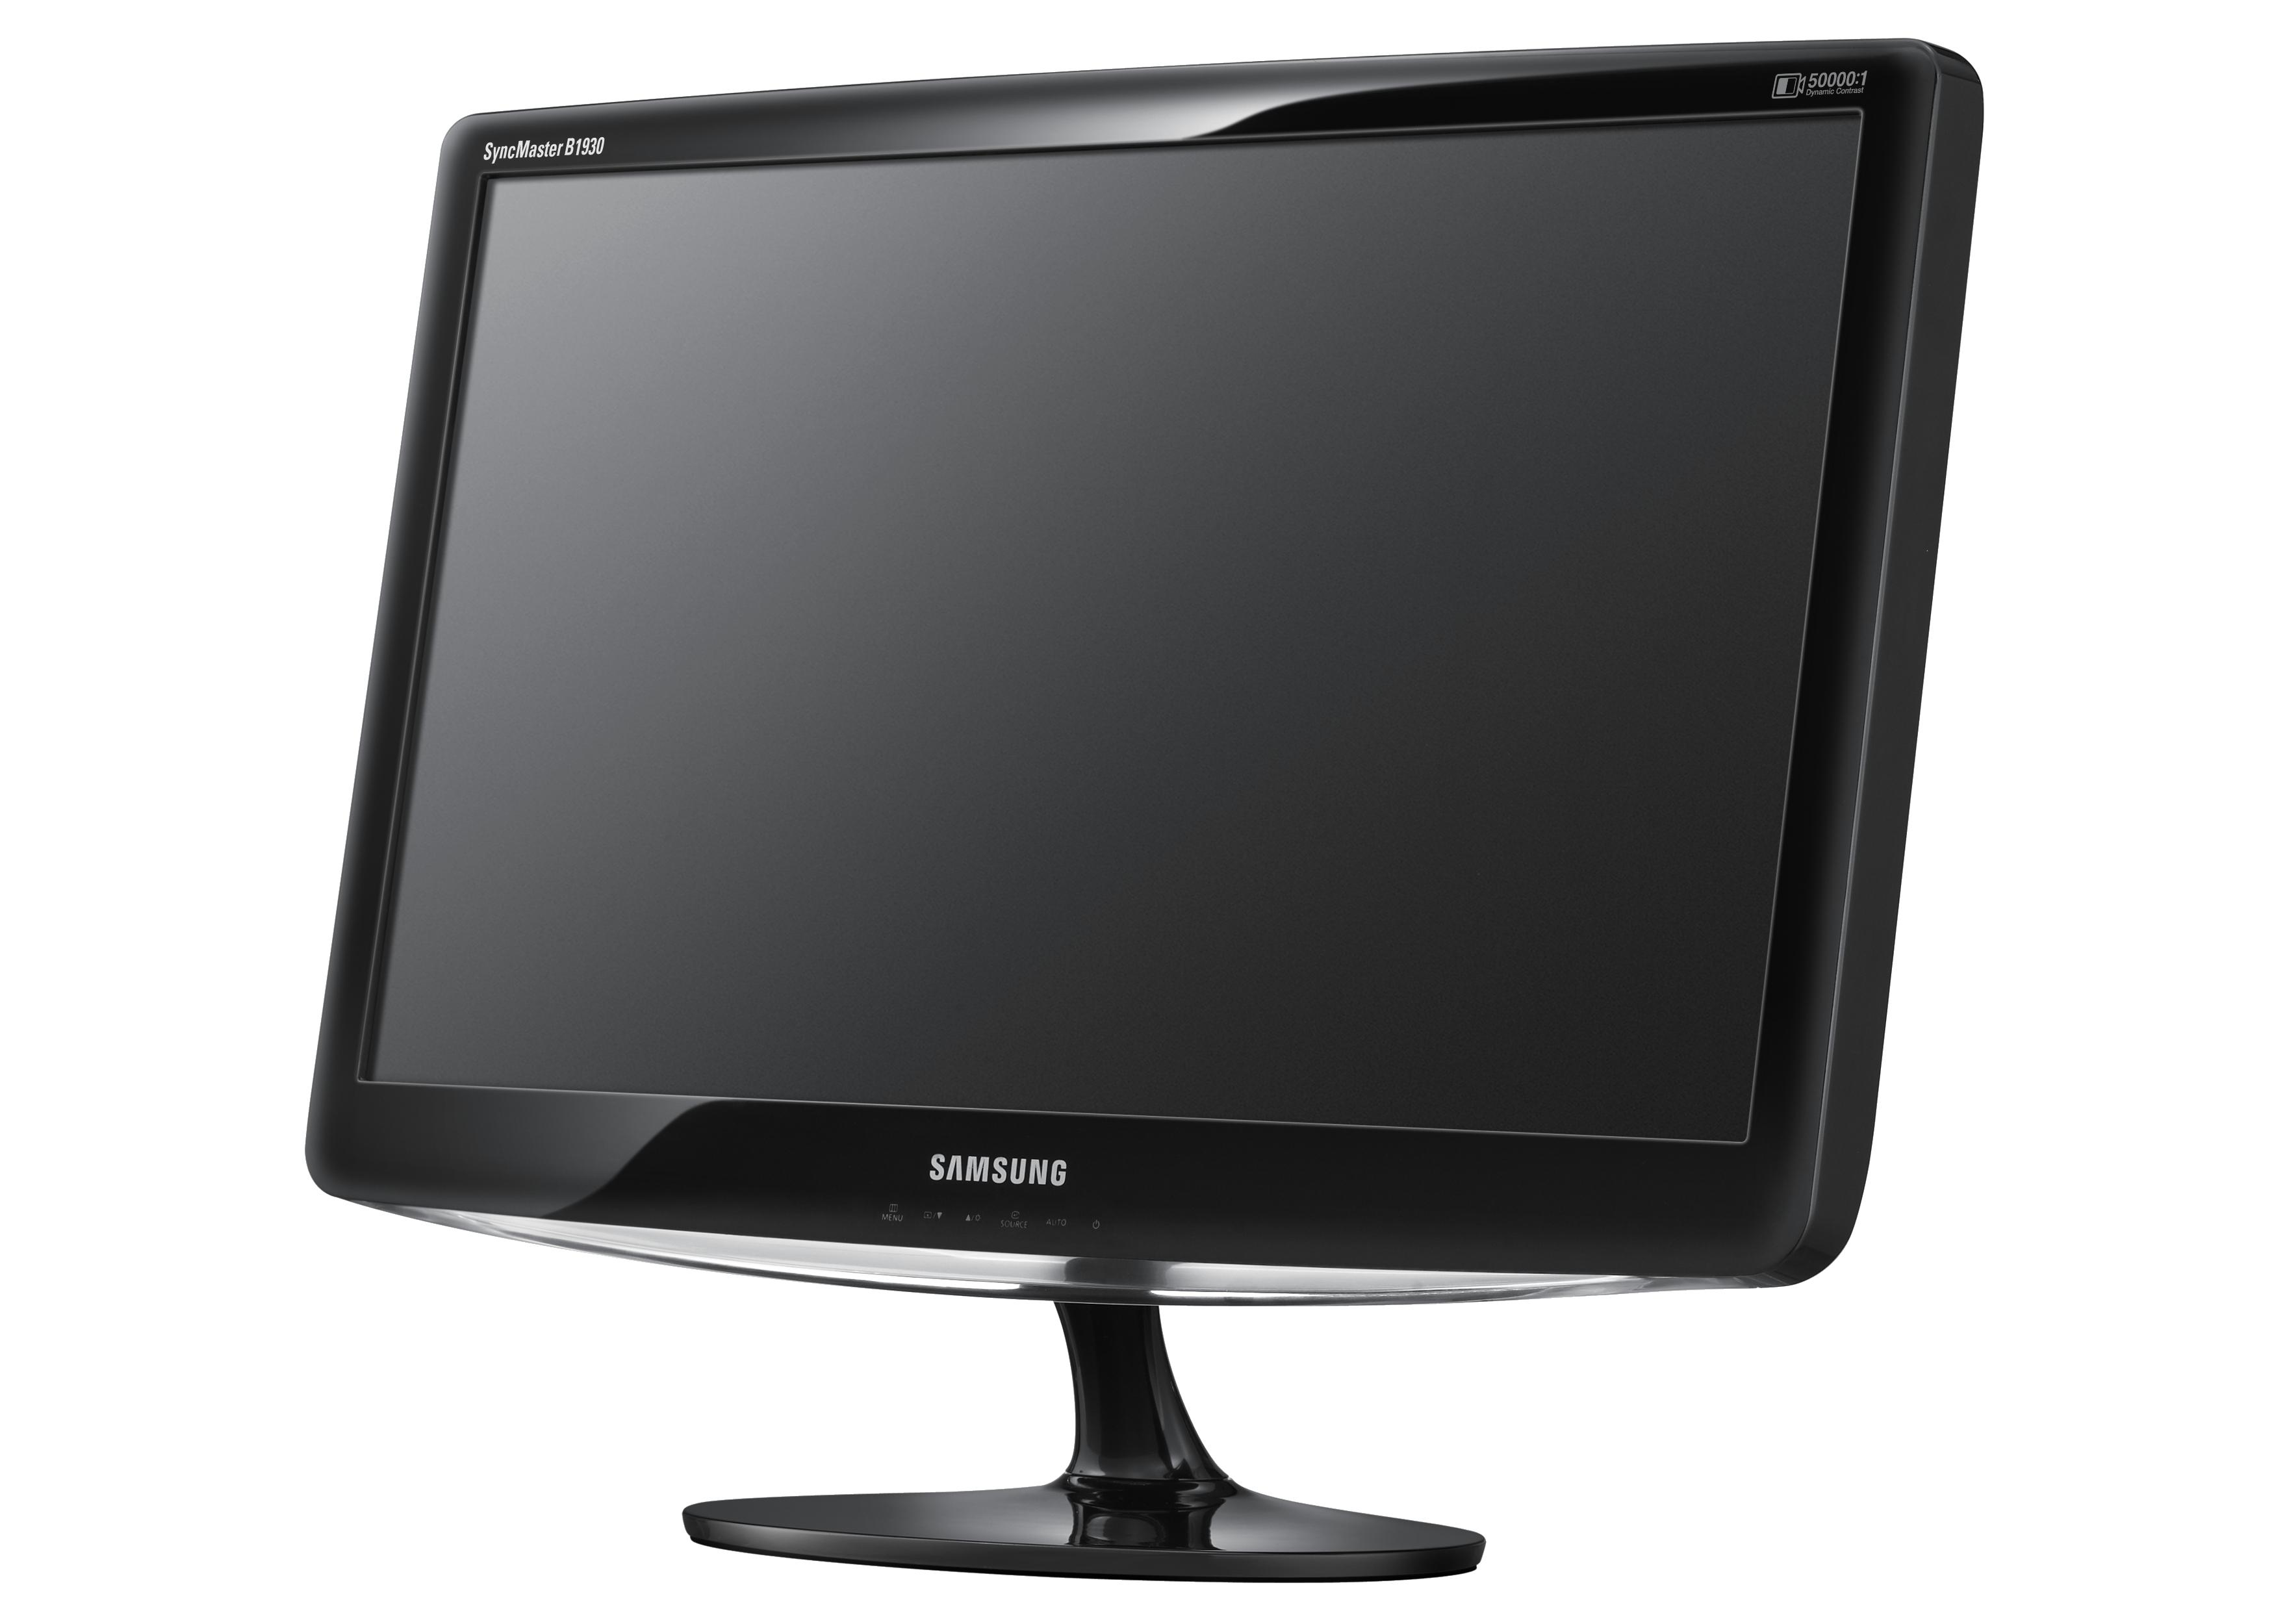 Lcd Monitor Png - Monitor Png Image, Transparent background PNG HD thumbnail